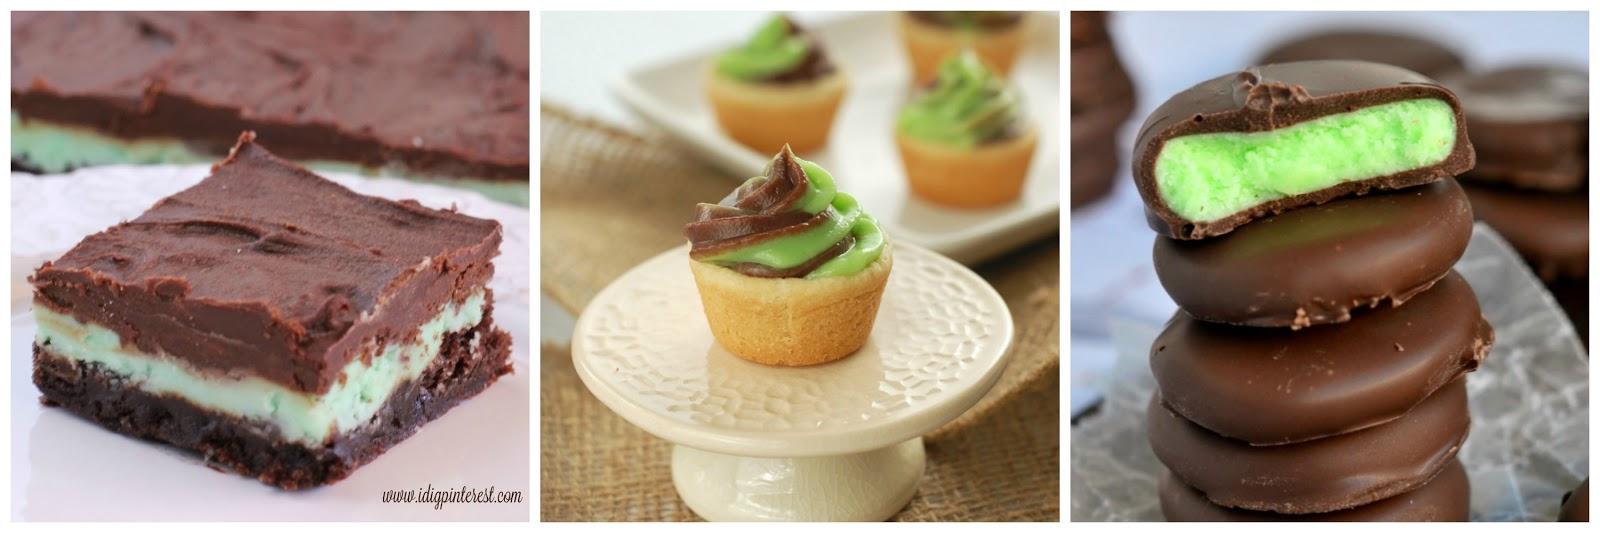 mint3 13 Mint Recipes 15